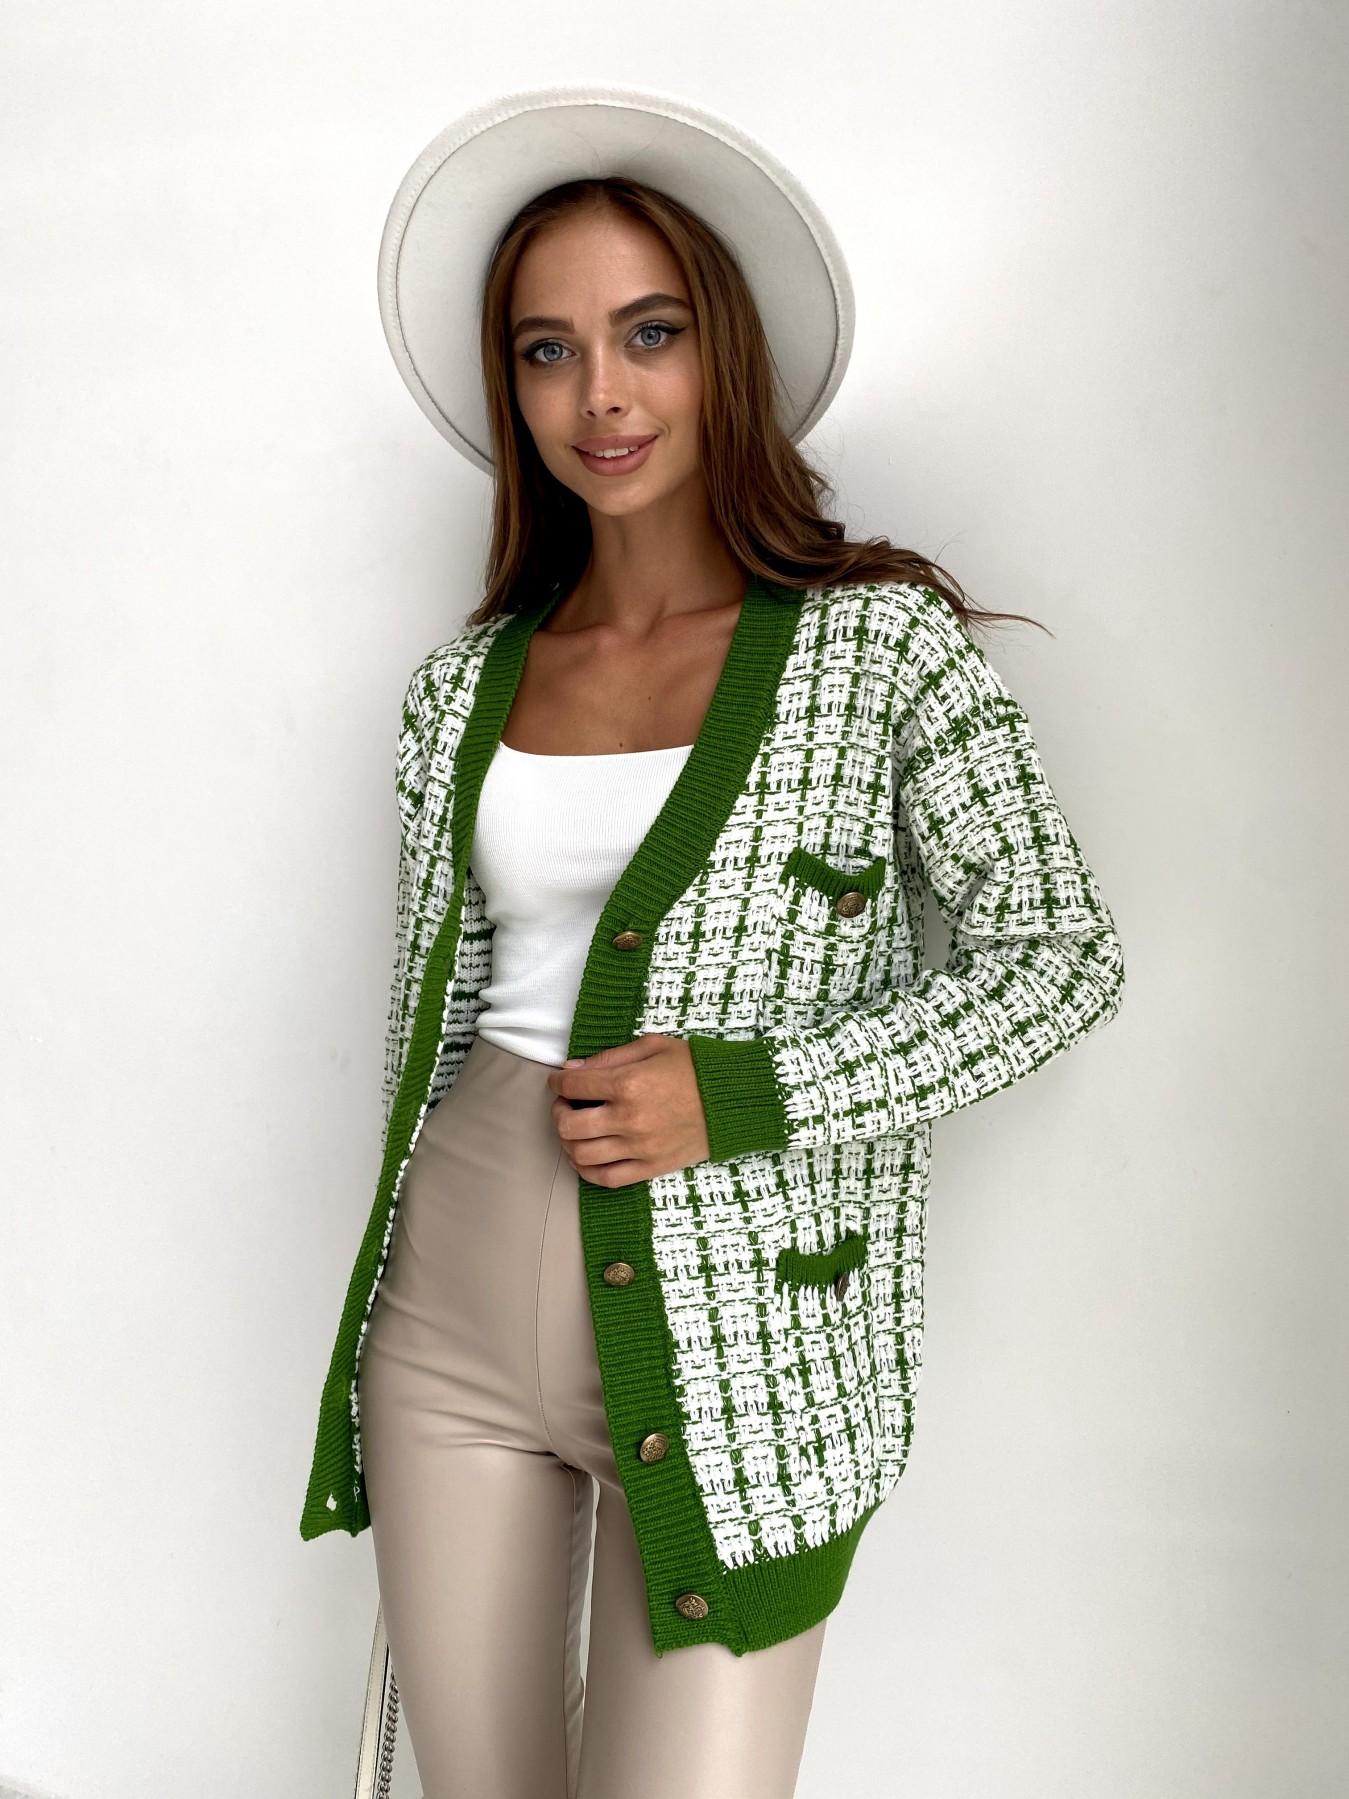 Кардиган 91022 АРТ. 48487 Цвет: Белый/Зеленый - фото 2, интернет магазин tm-modus.ru